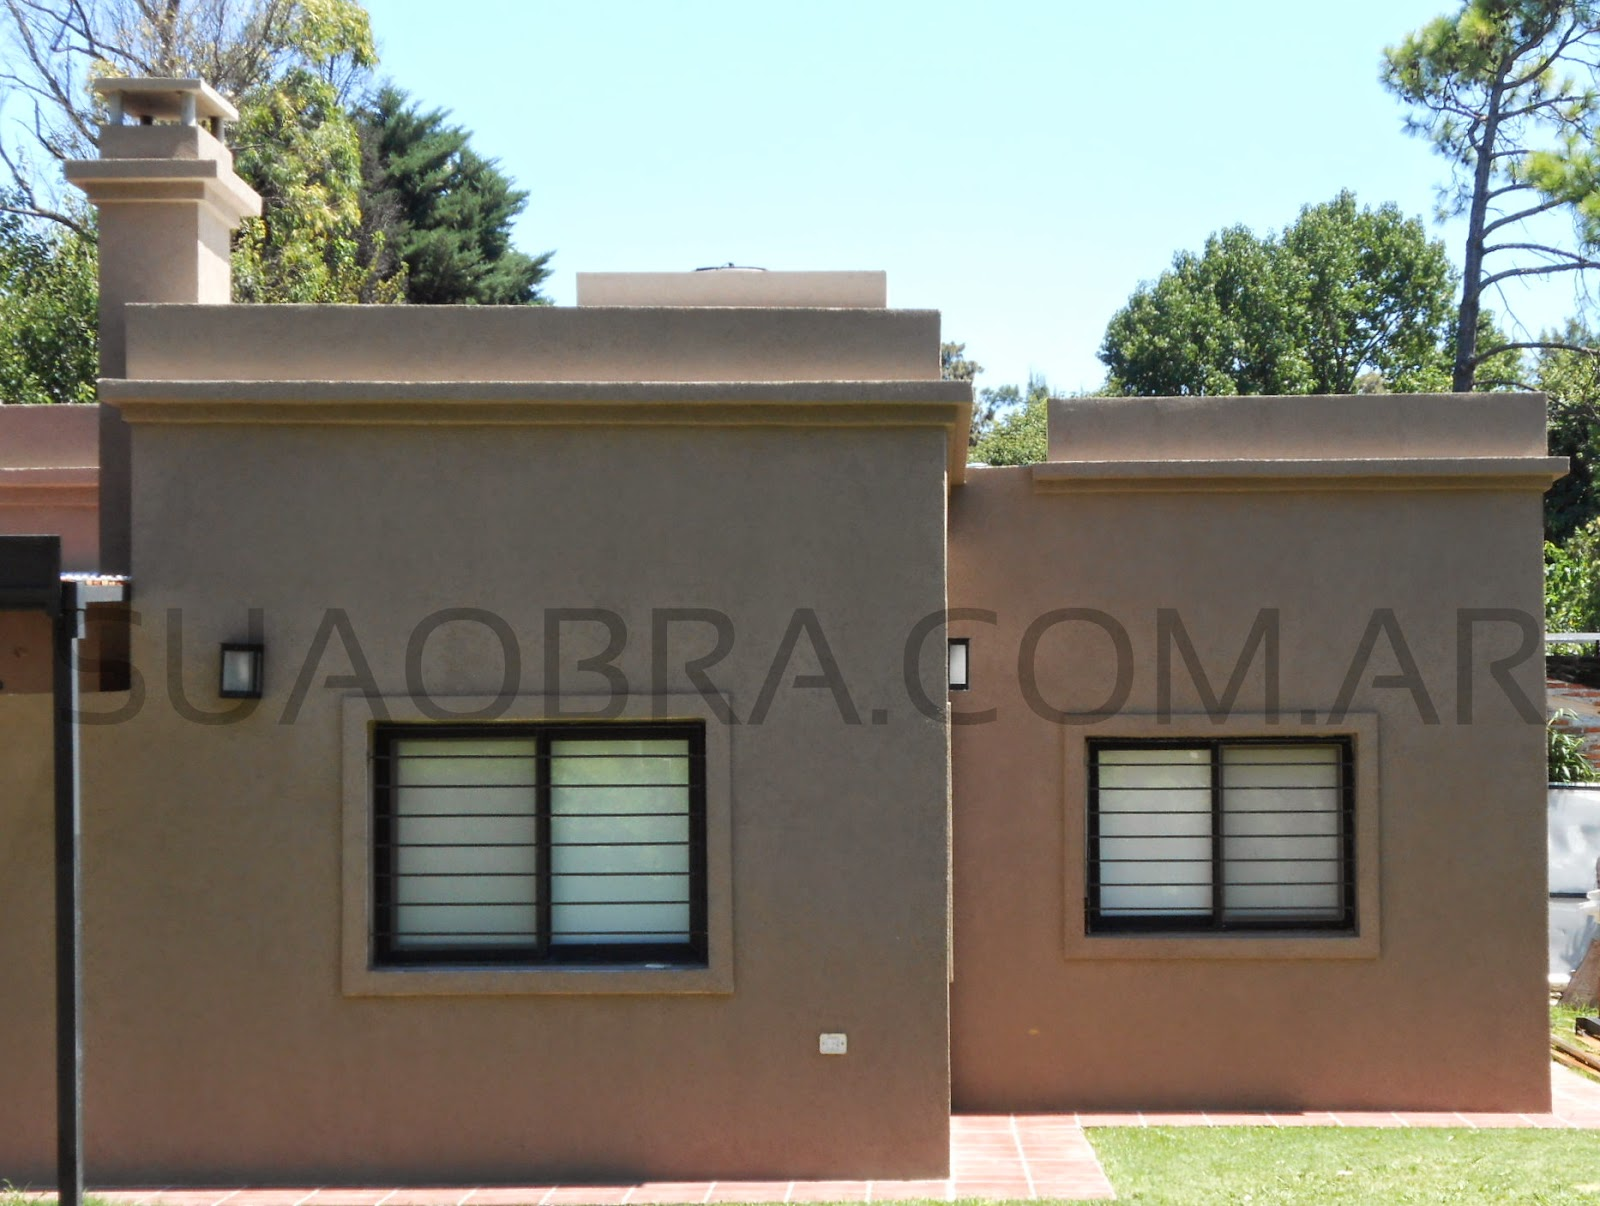 Tarquini aplicacion revestimientos plasticos exteriores for Pintura para pared exterior